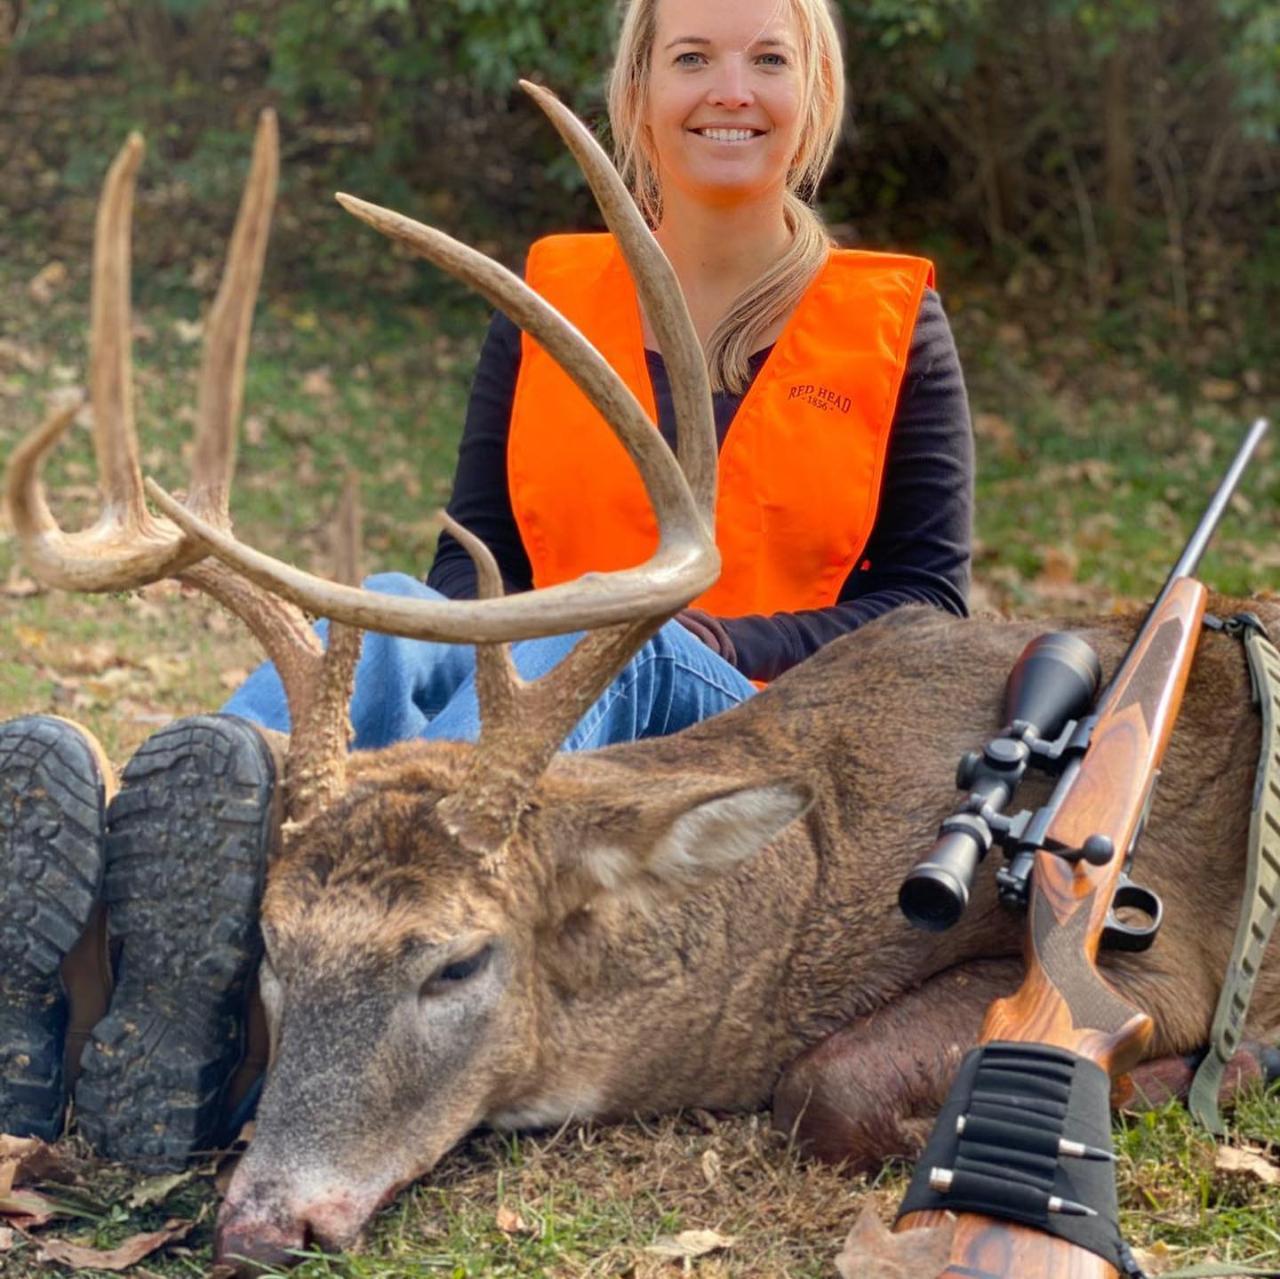 North Camp Kentucky 2 Day 3 Night Rifle Hunt - Opening Week